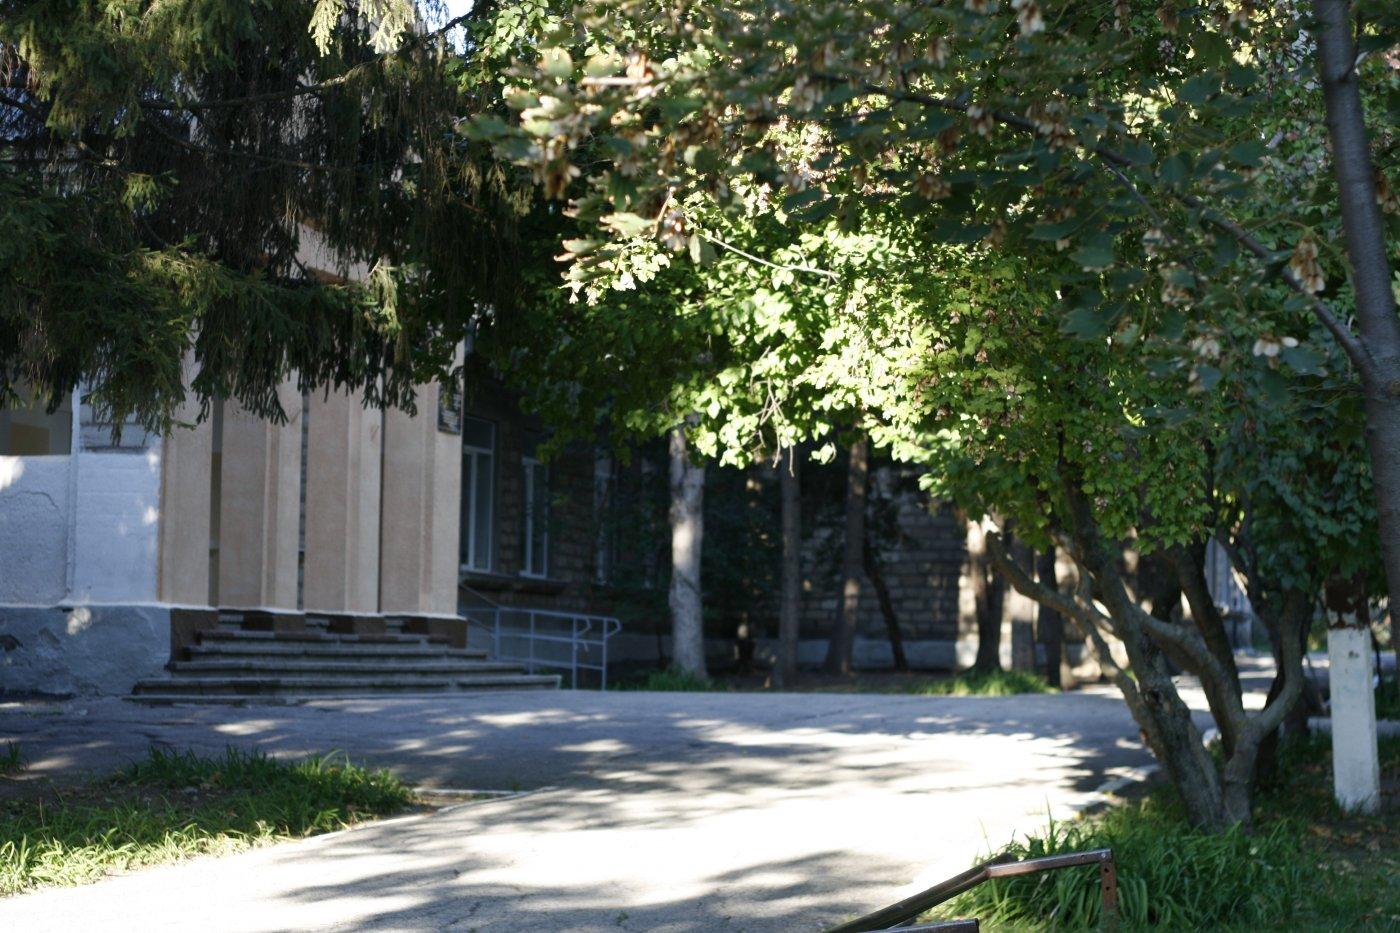 Фото _MG_7267.JPG. Молдова, Бендеры, улица Протягайловская